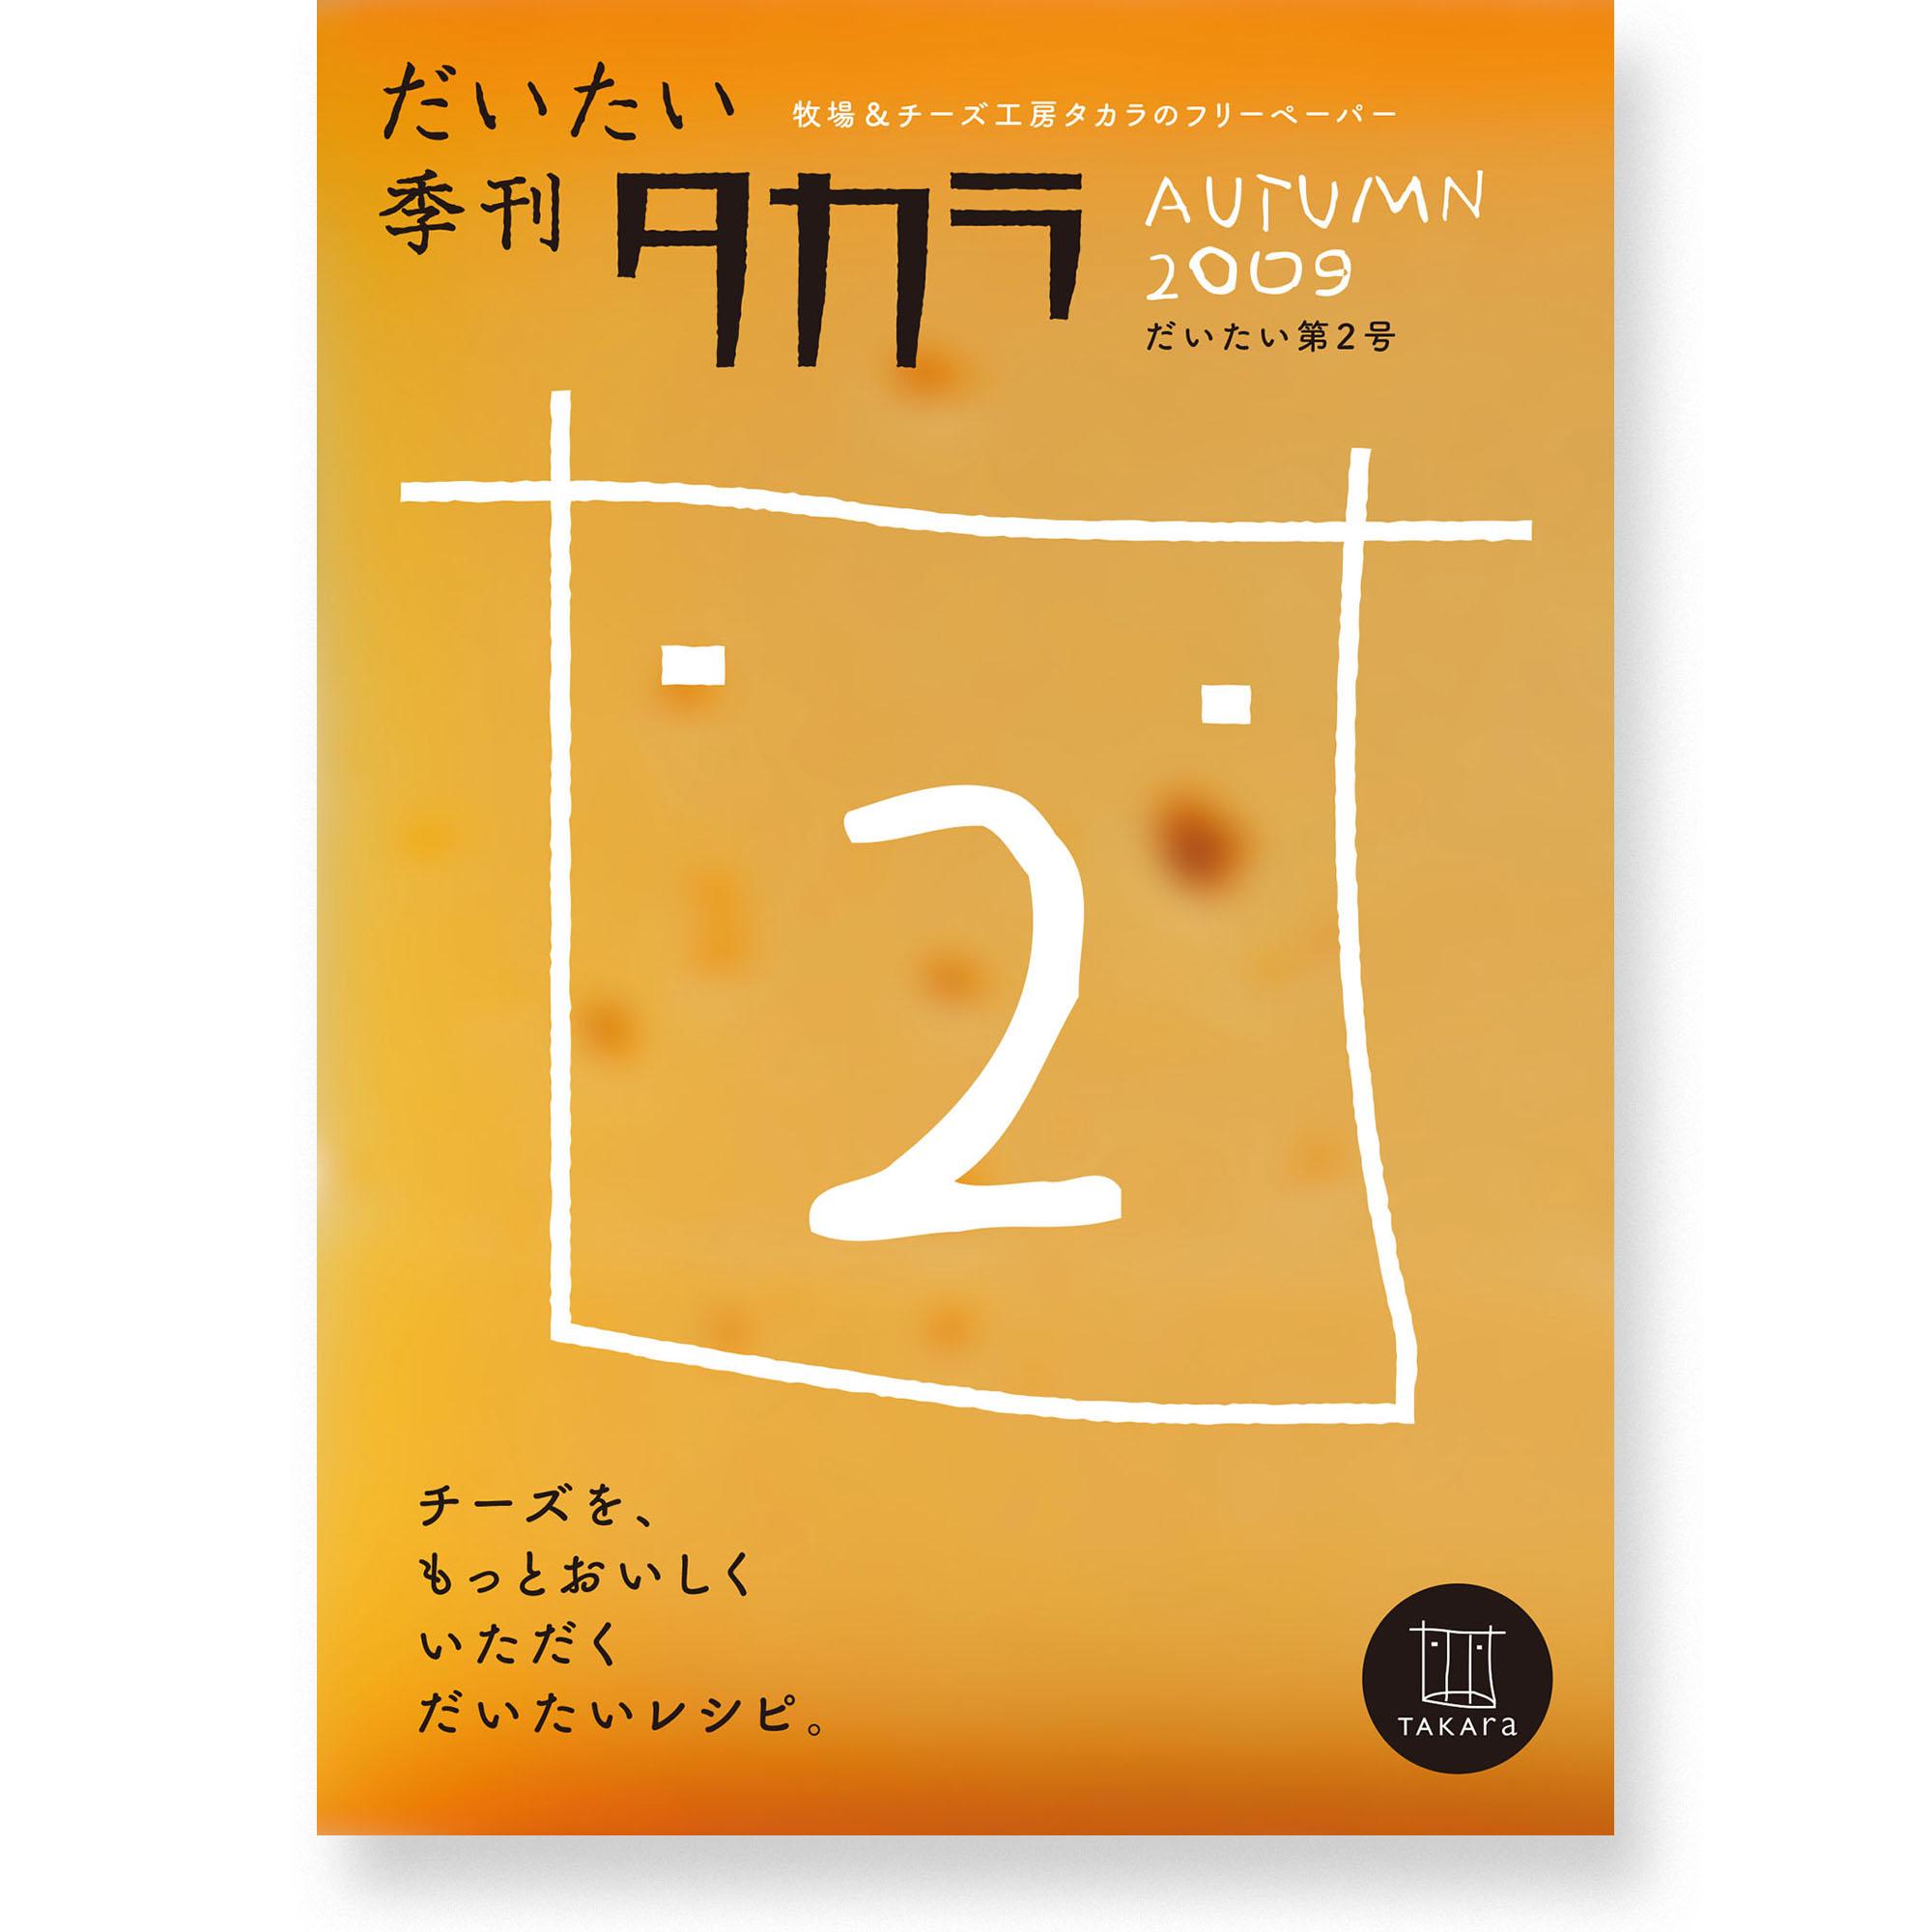 Daitai Quarterly Takara Vol.2